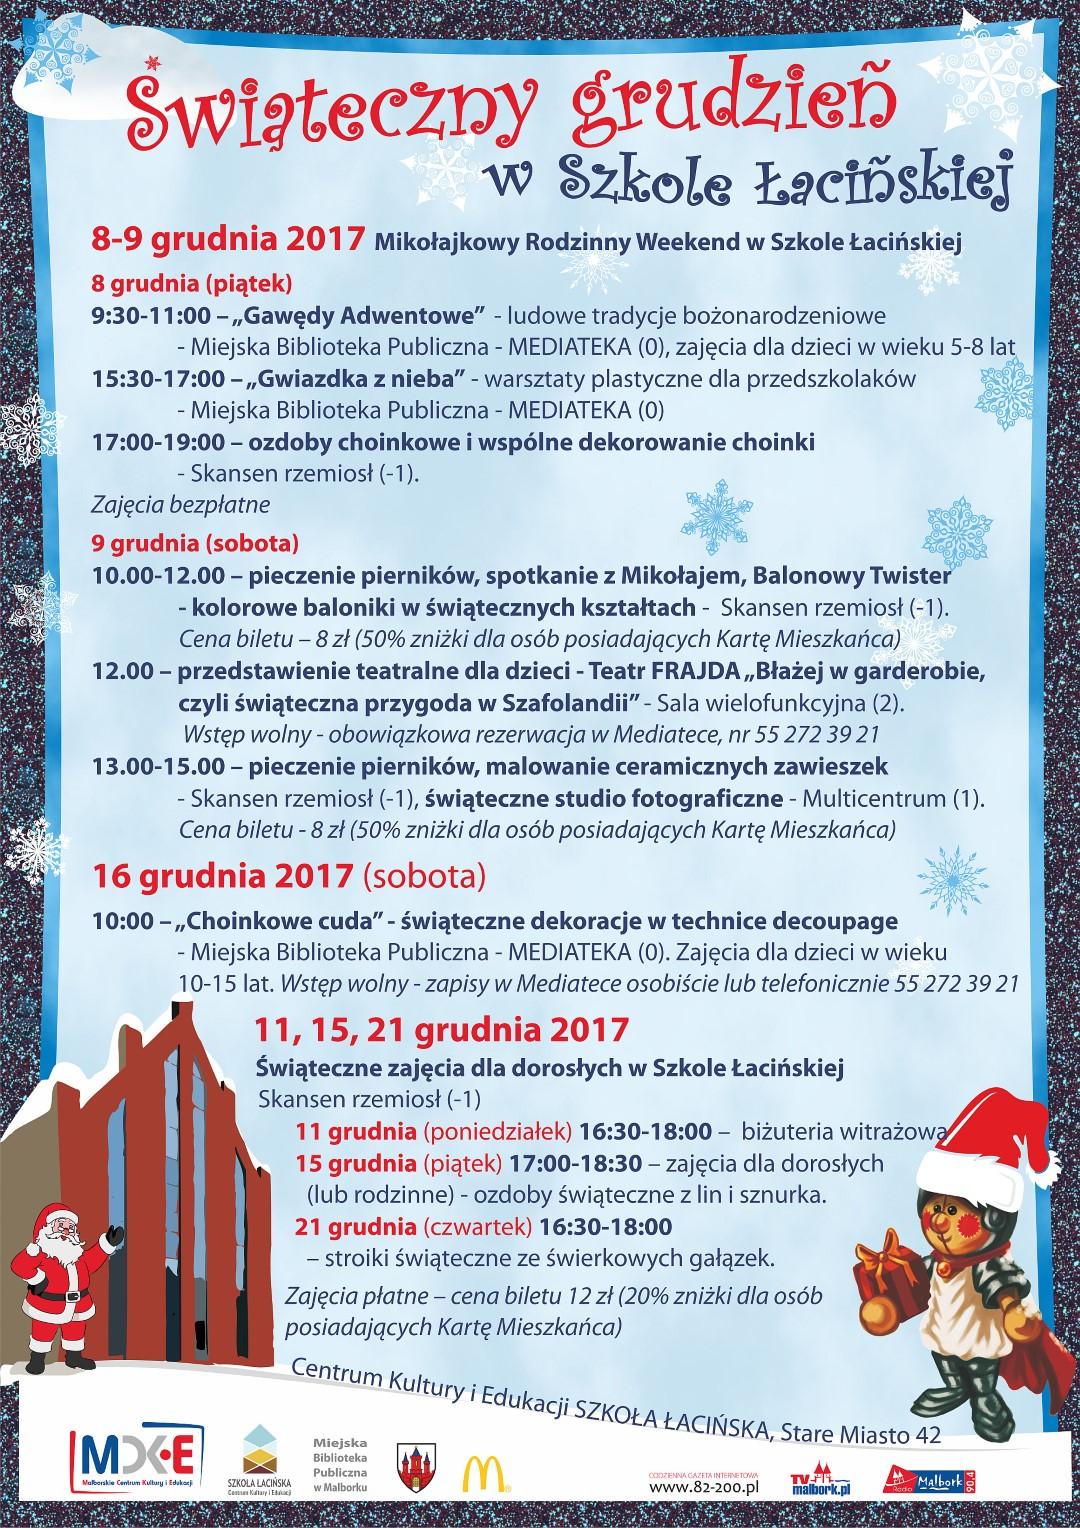 http://m.82-200.pl/2017/11/orig/plakatmikolajkilatinium17-2067.jpg